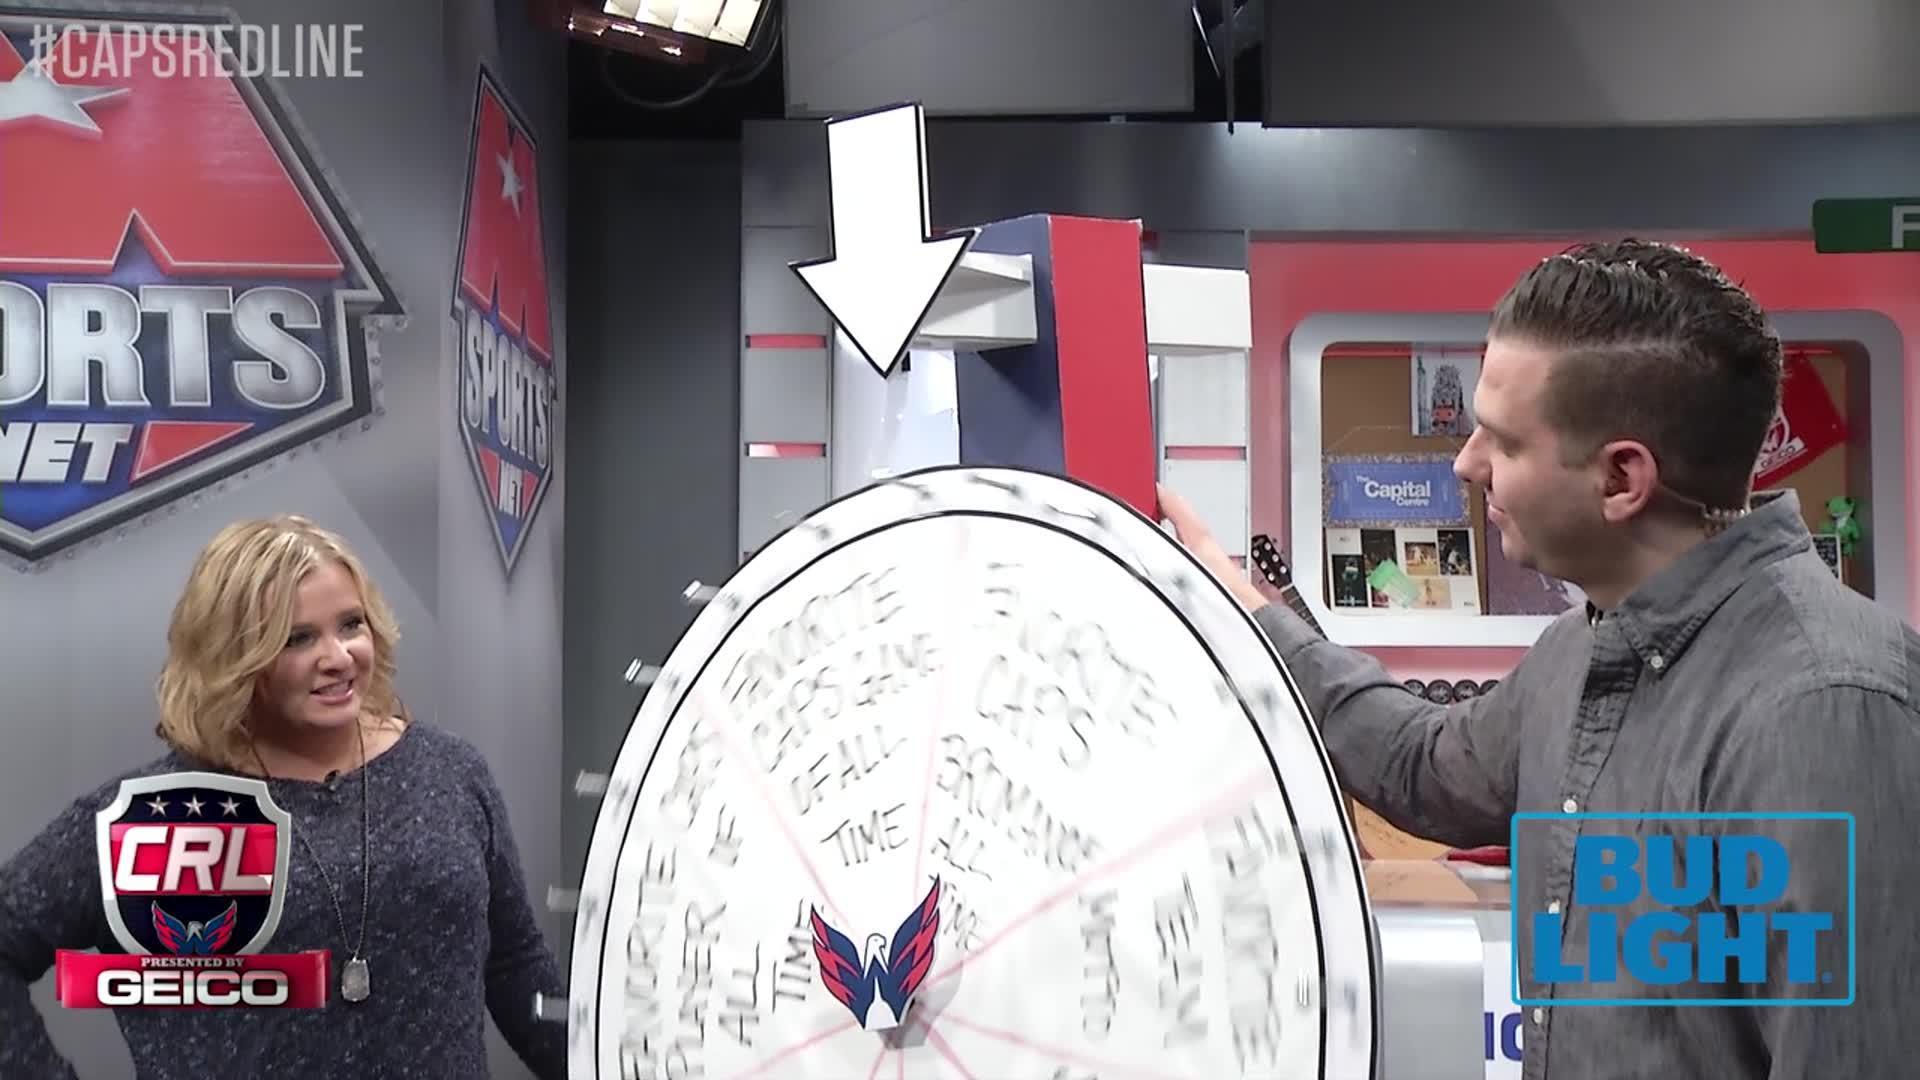 Caps Red Line: Caps vs Buffalo Pt 2 12-5-16